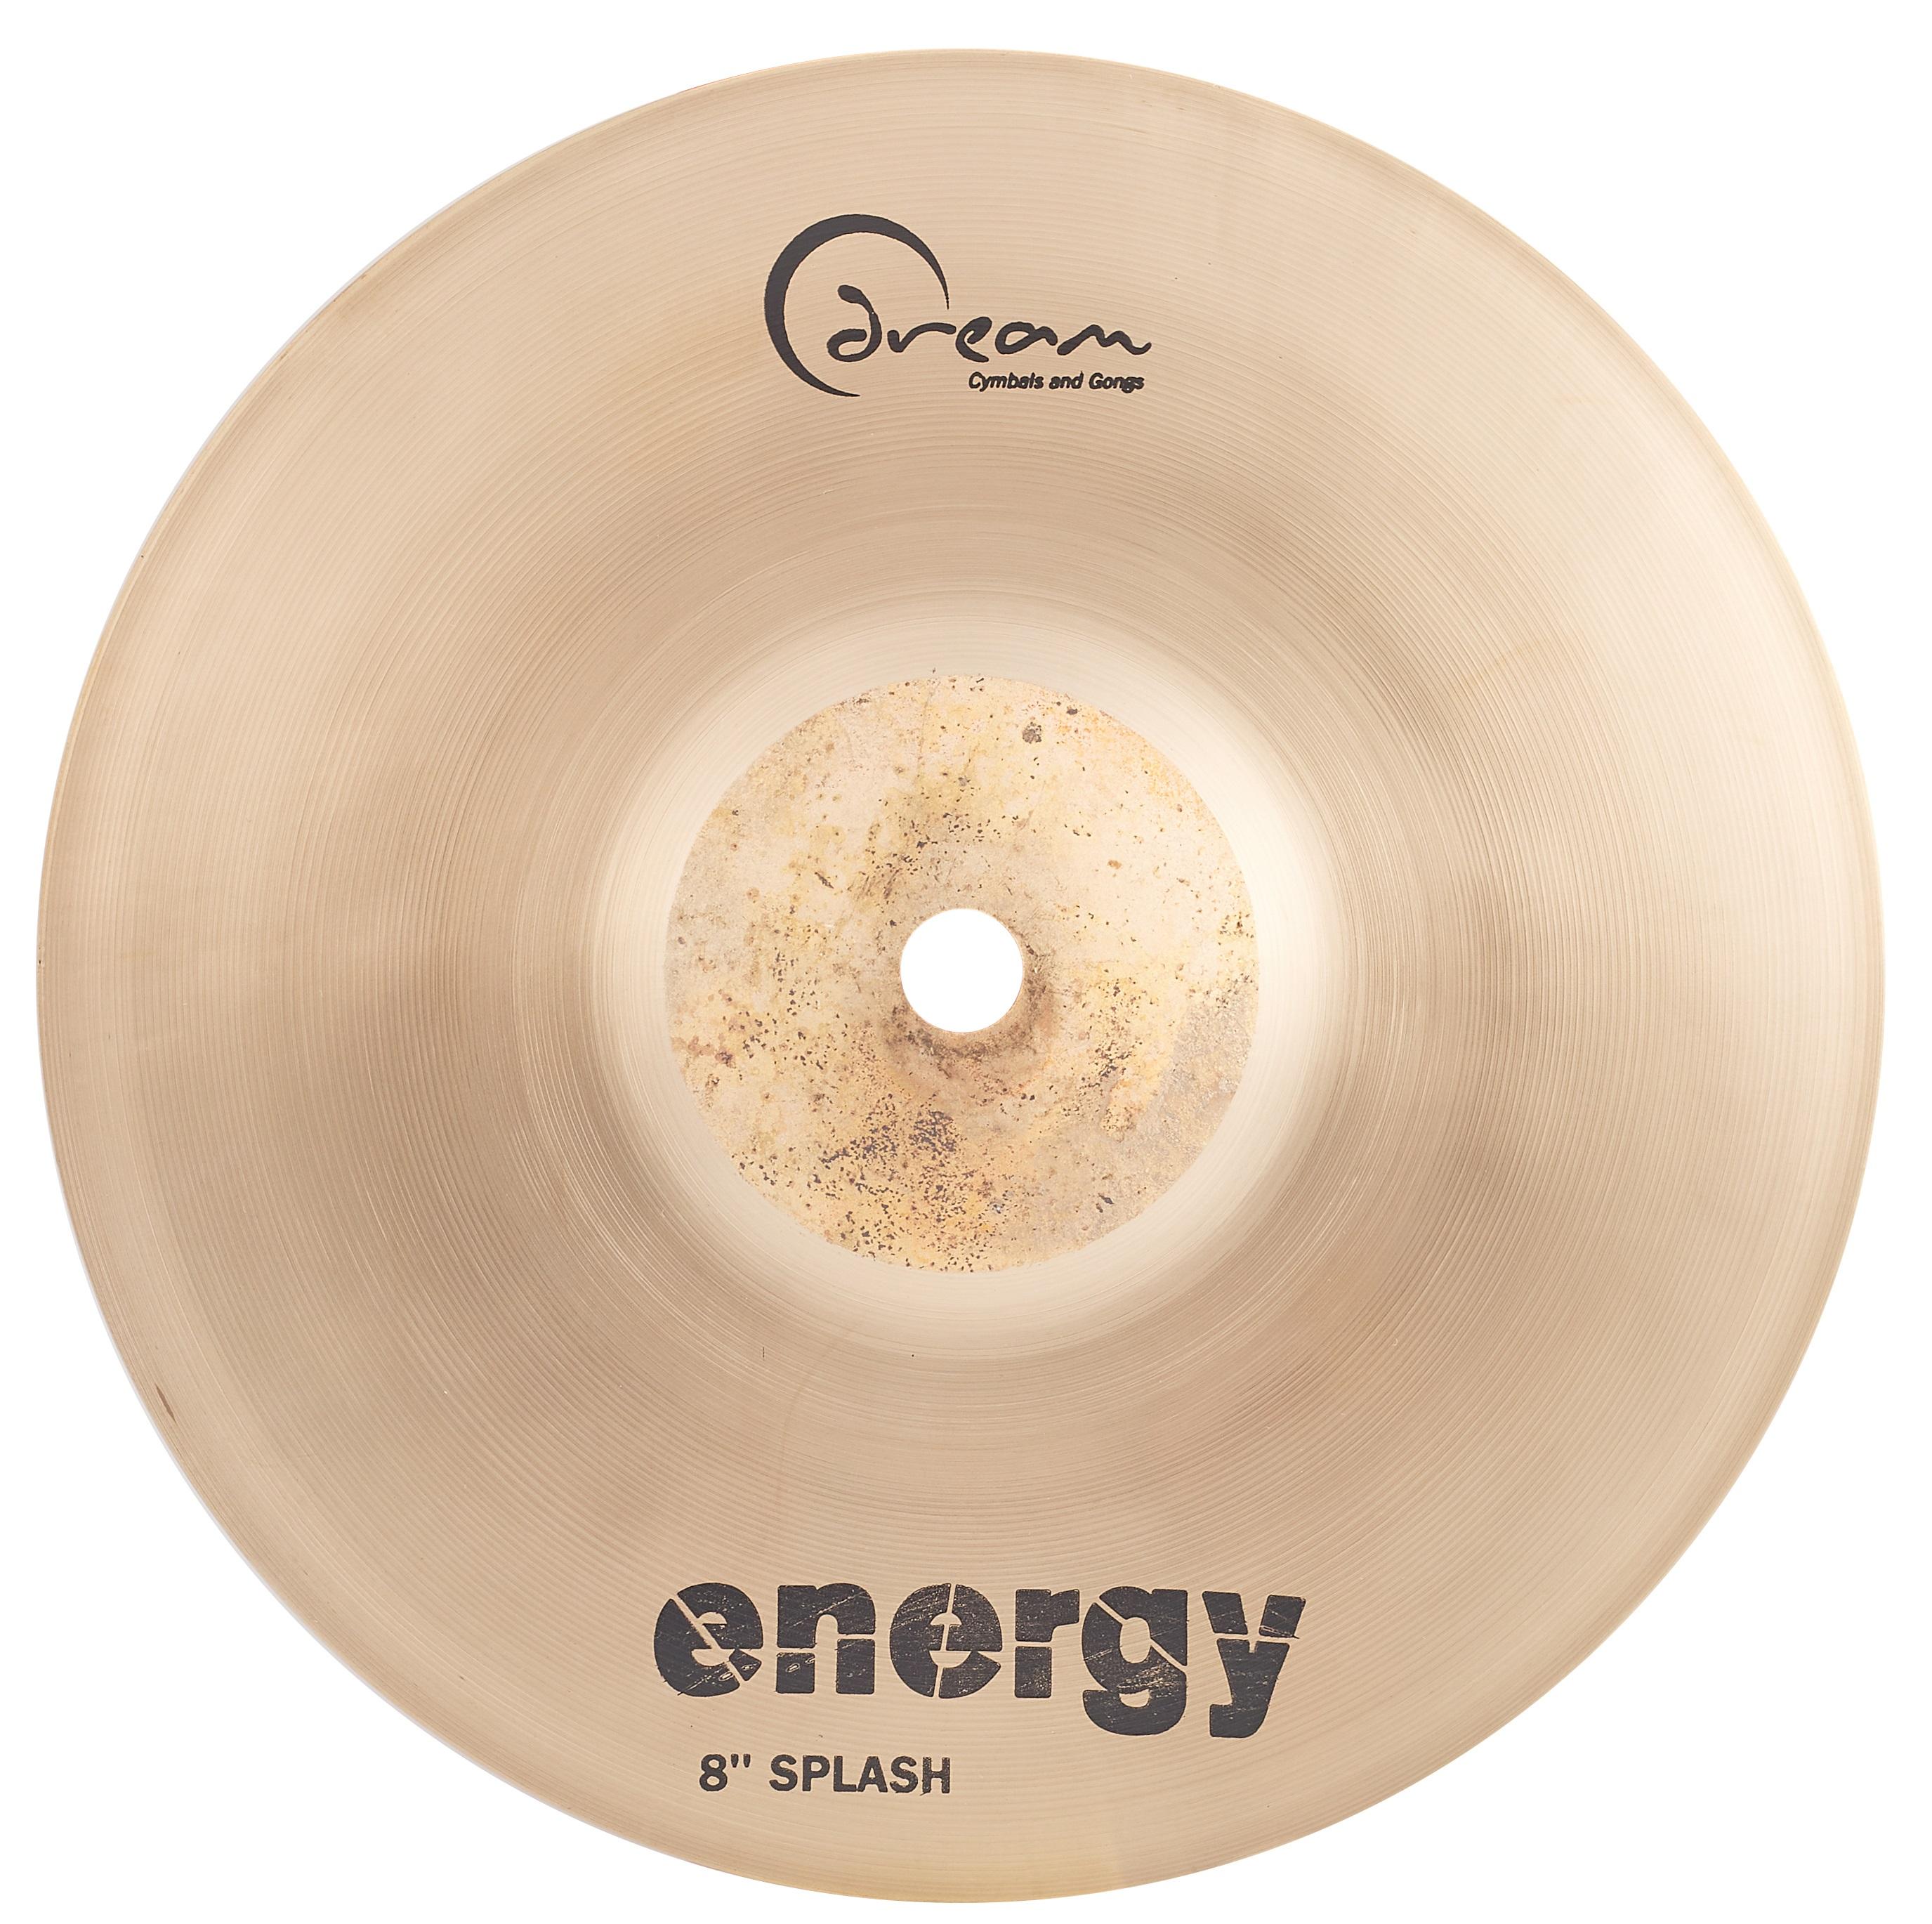 "Dream 8"" Energy Series Splash"